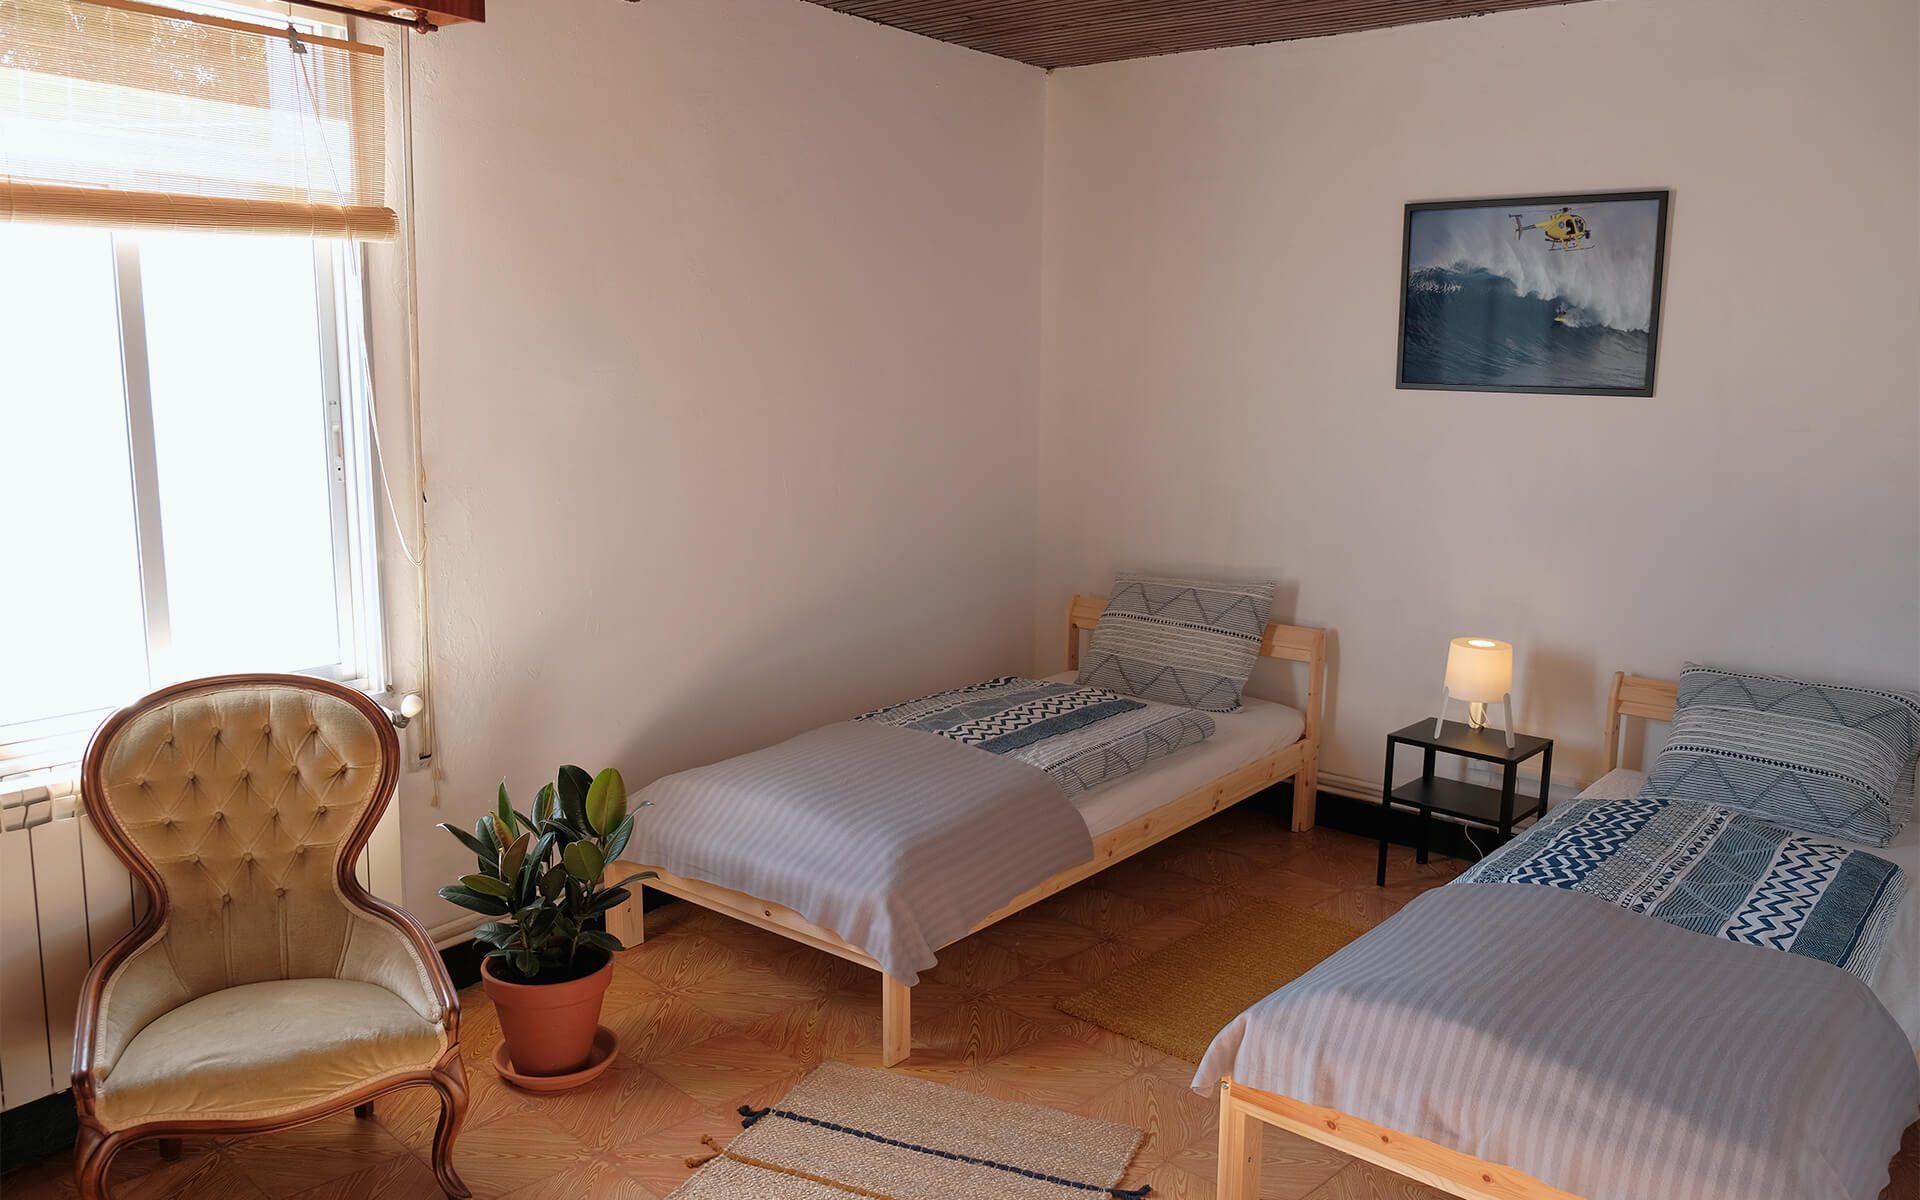 Großes, helles Zweibettzimmer